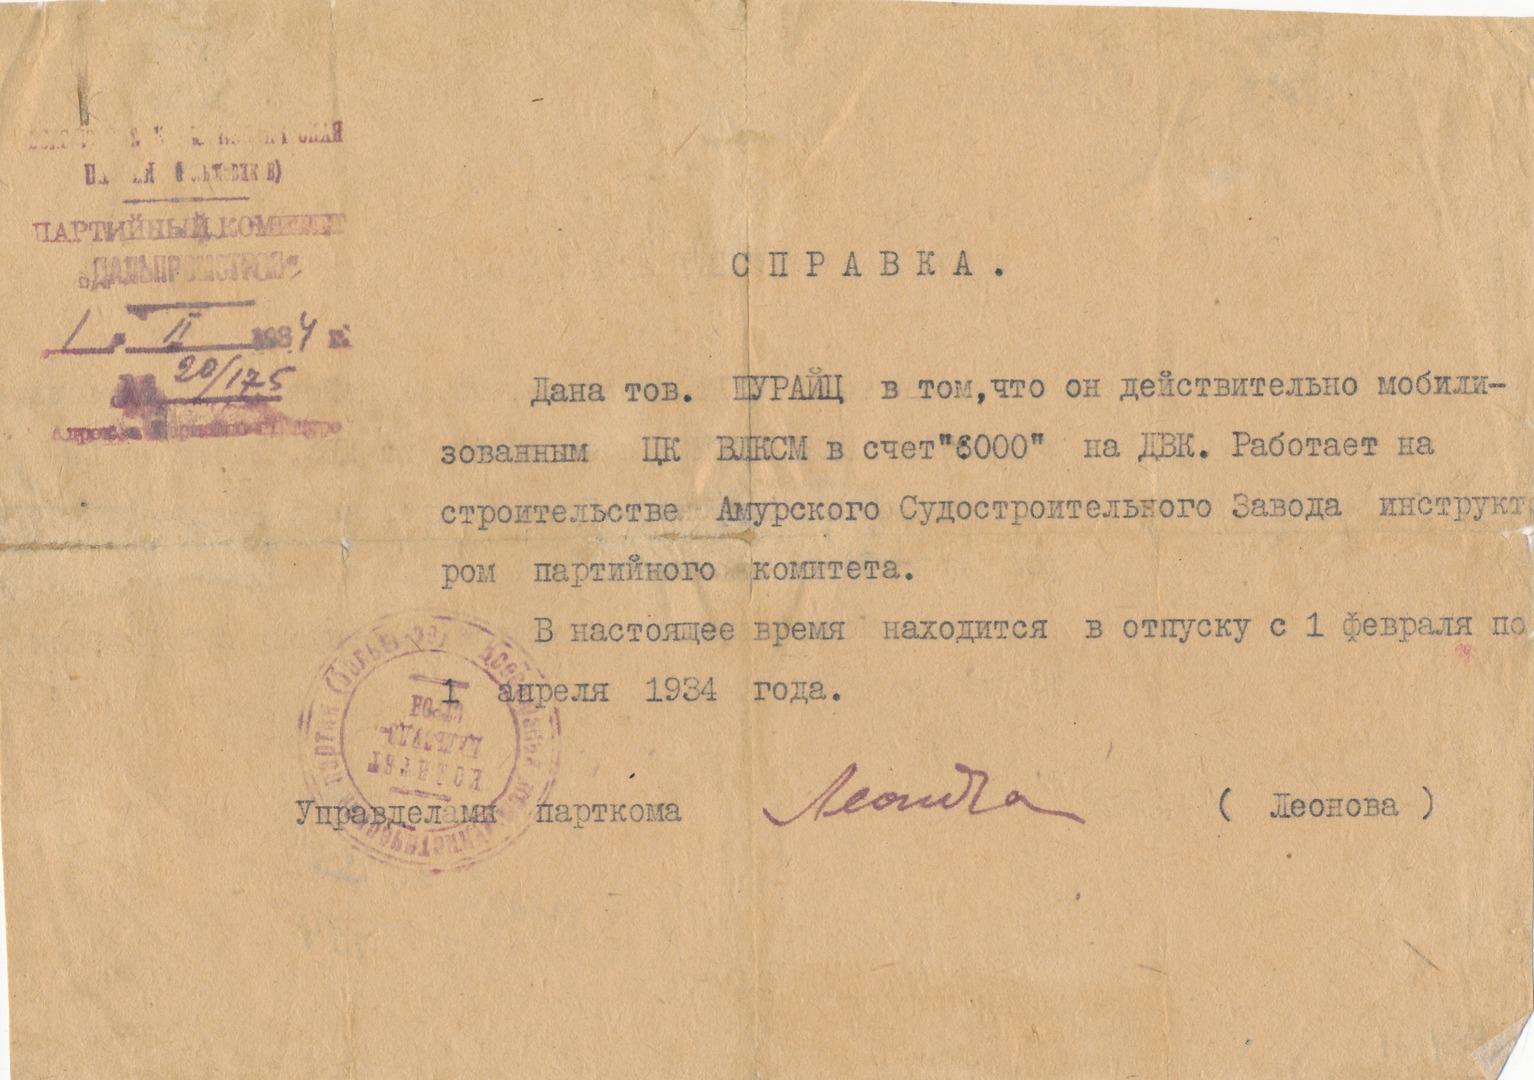 Справка  № 20-175 партийного комитета